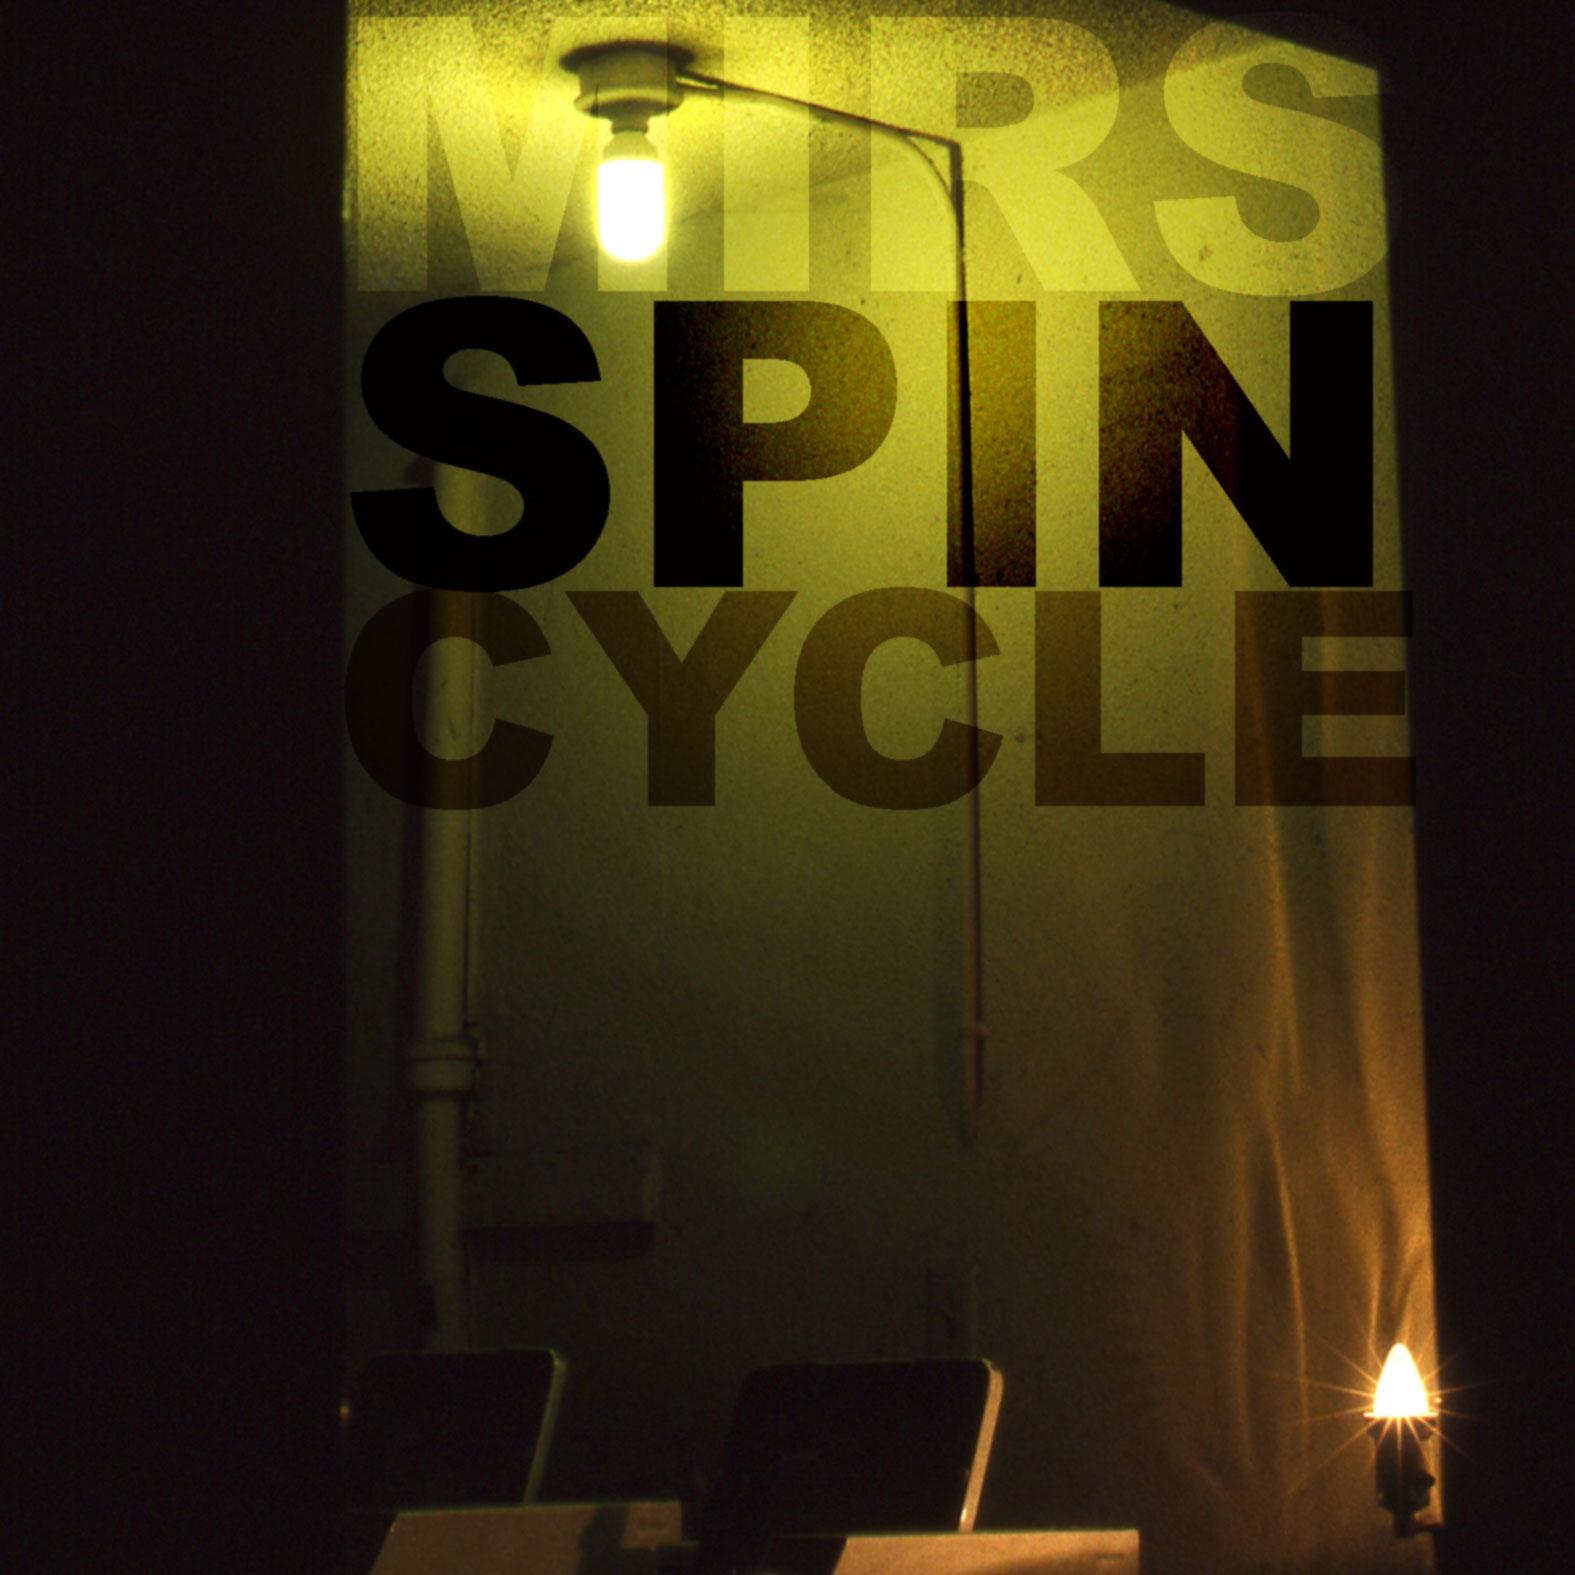 Spin-Cycle-album-art-test.jpg